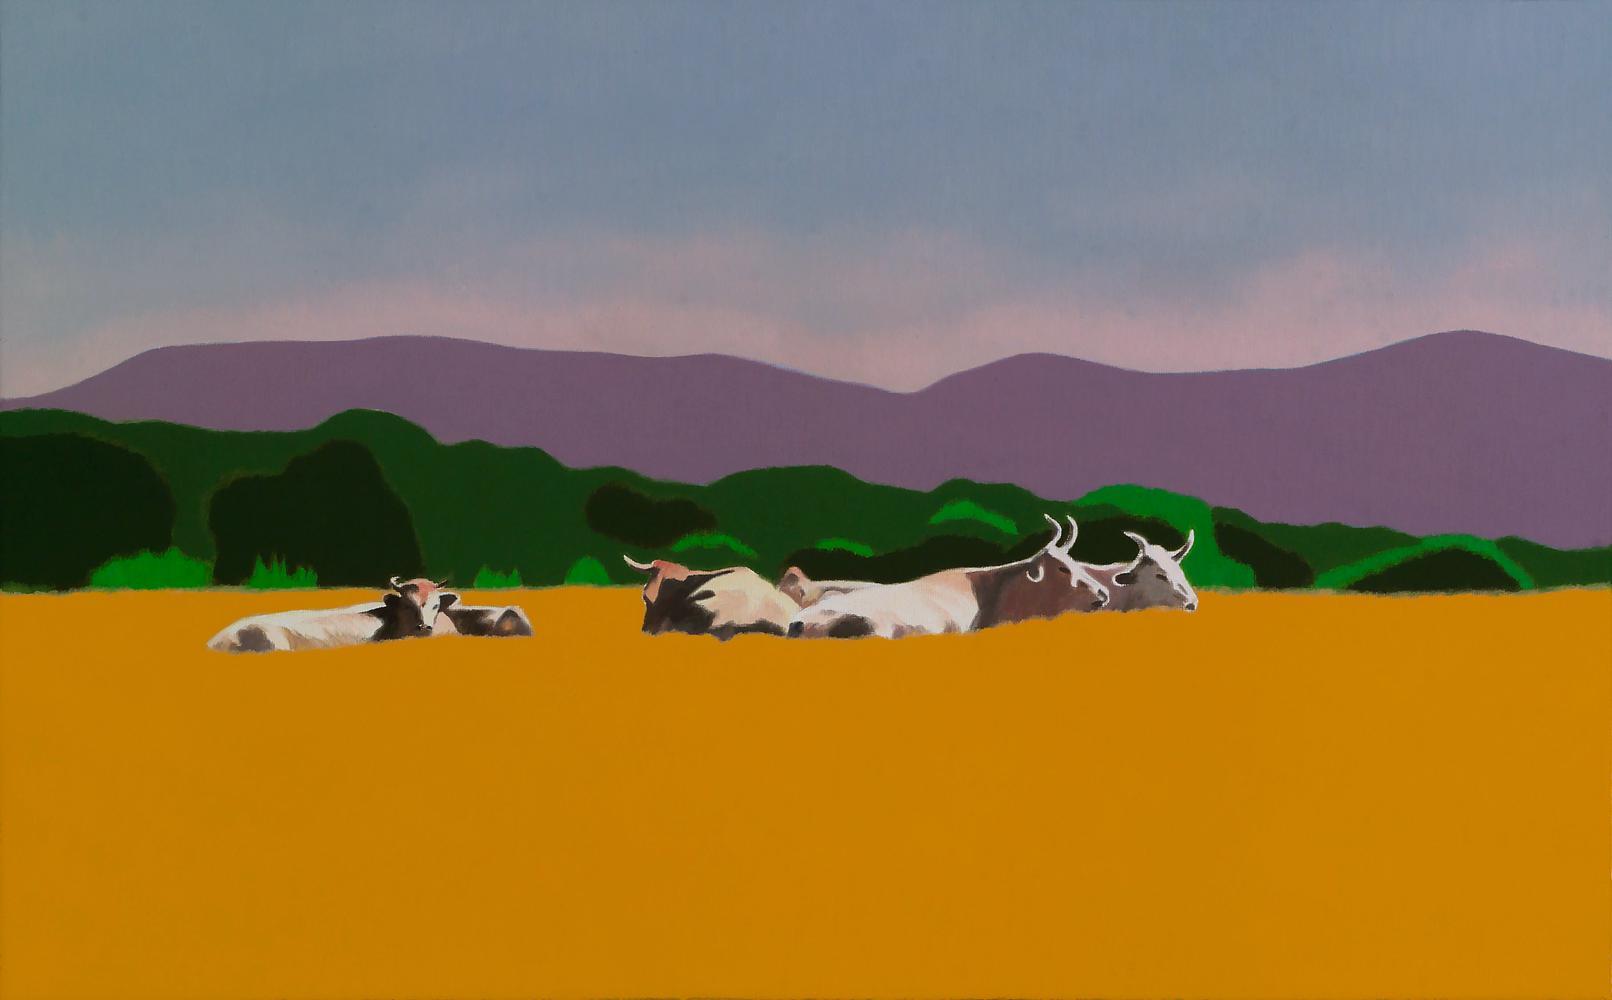 Vacas en Burguete, 38 x 61 cm, óleo lienzo, 2015.